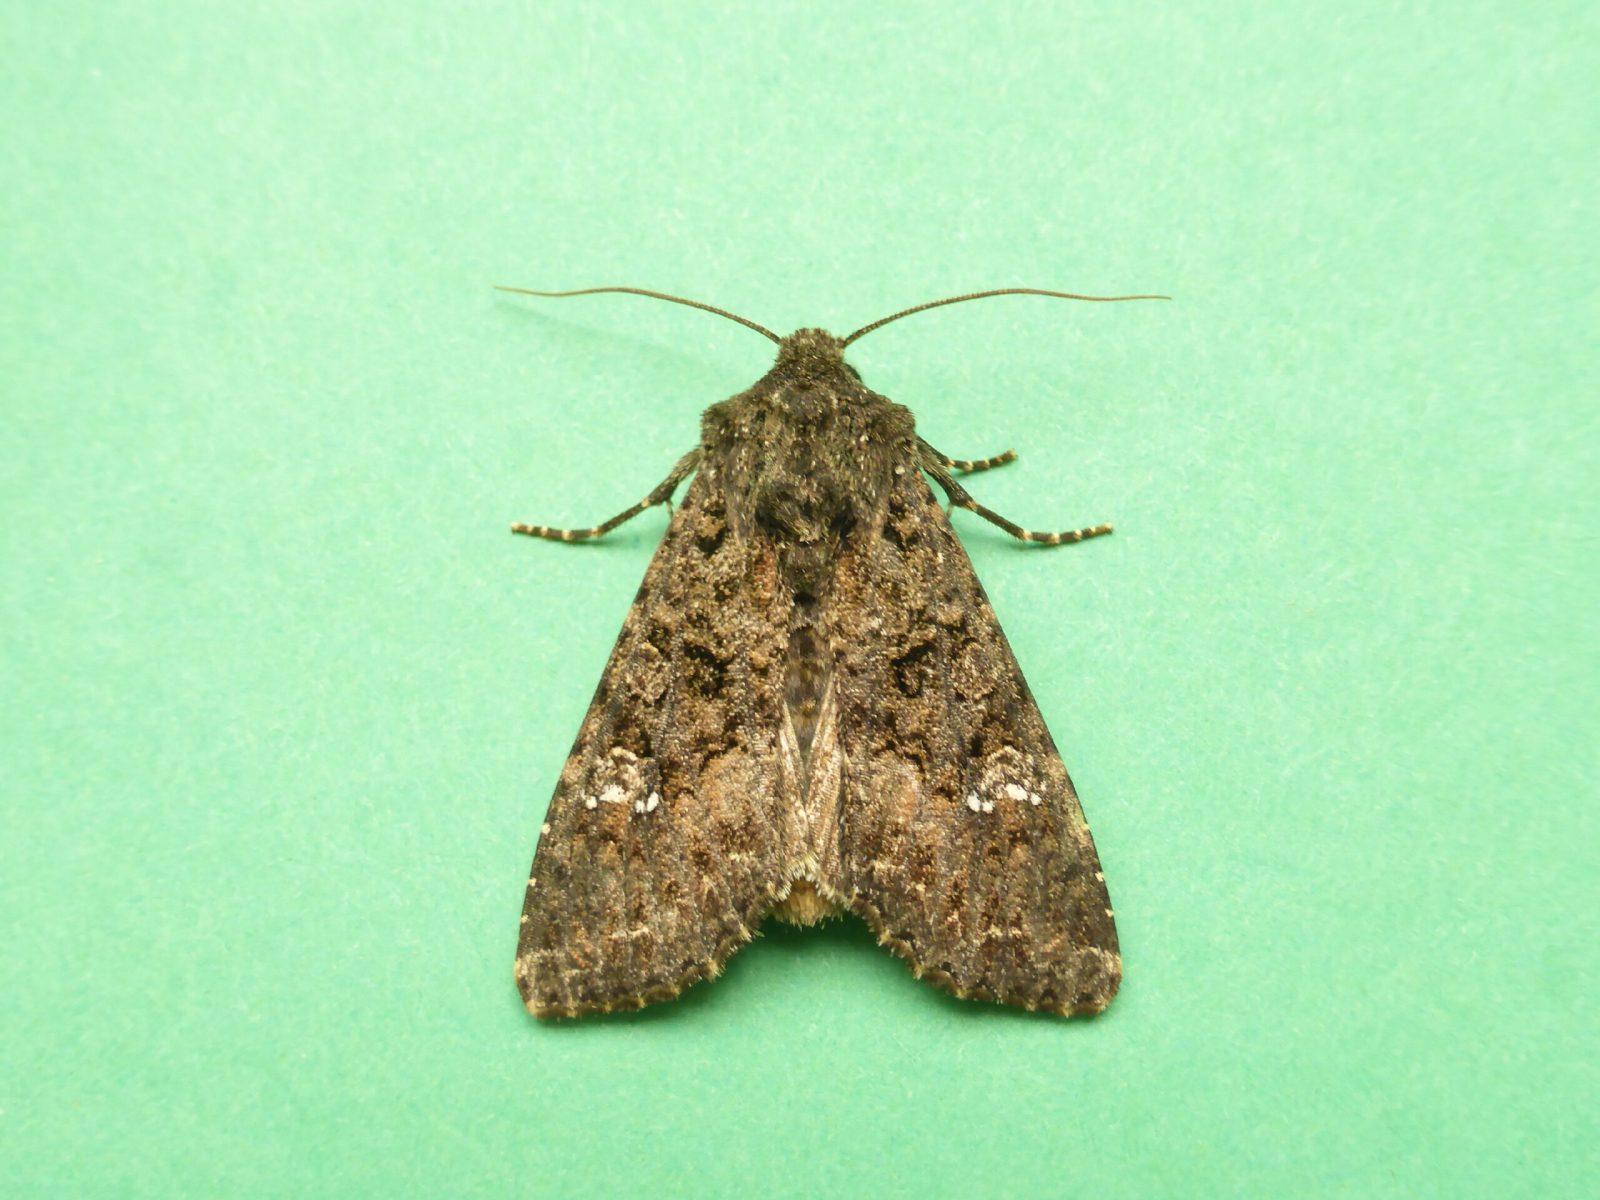 Mamestra brassicae - Cabbage Moth - Kirk Smeaton